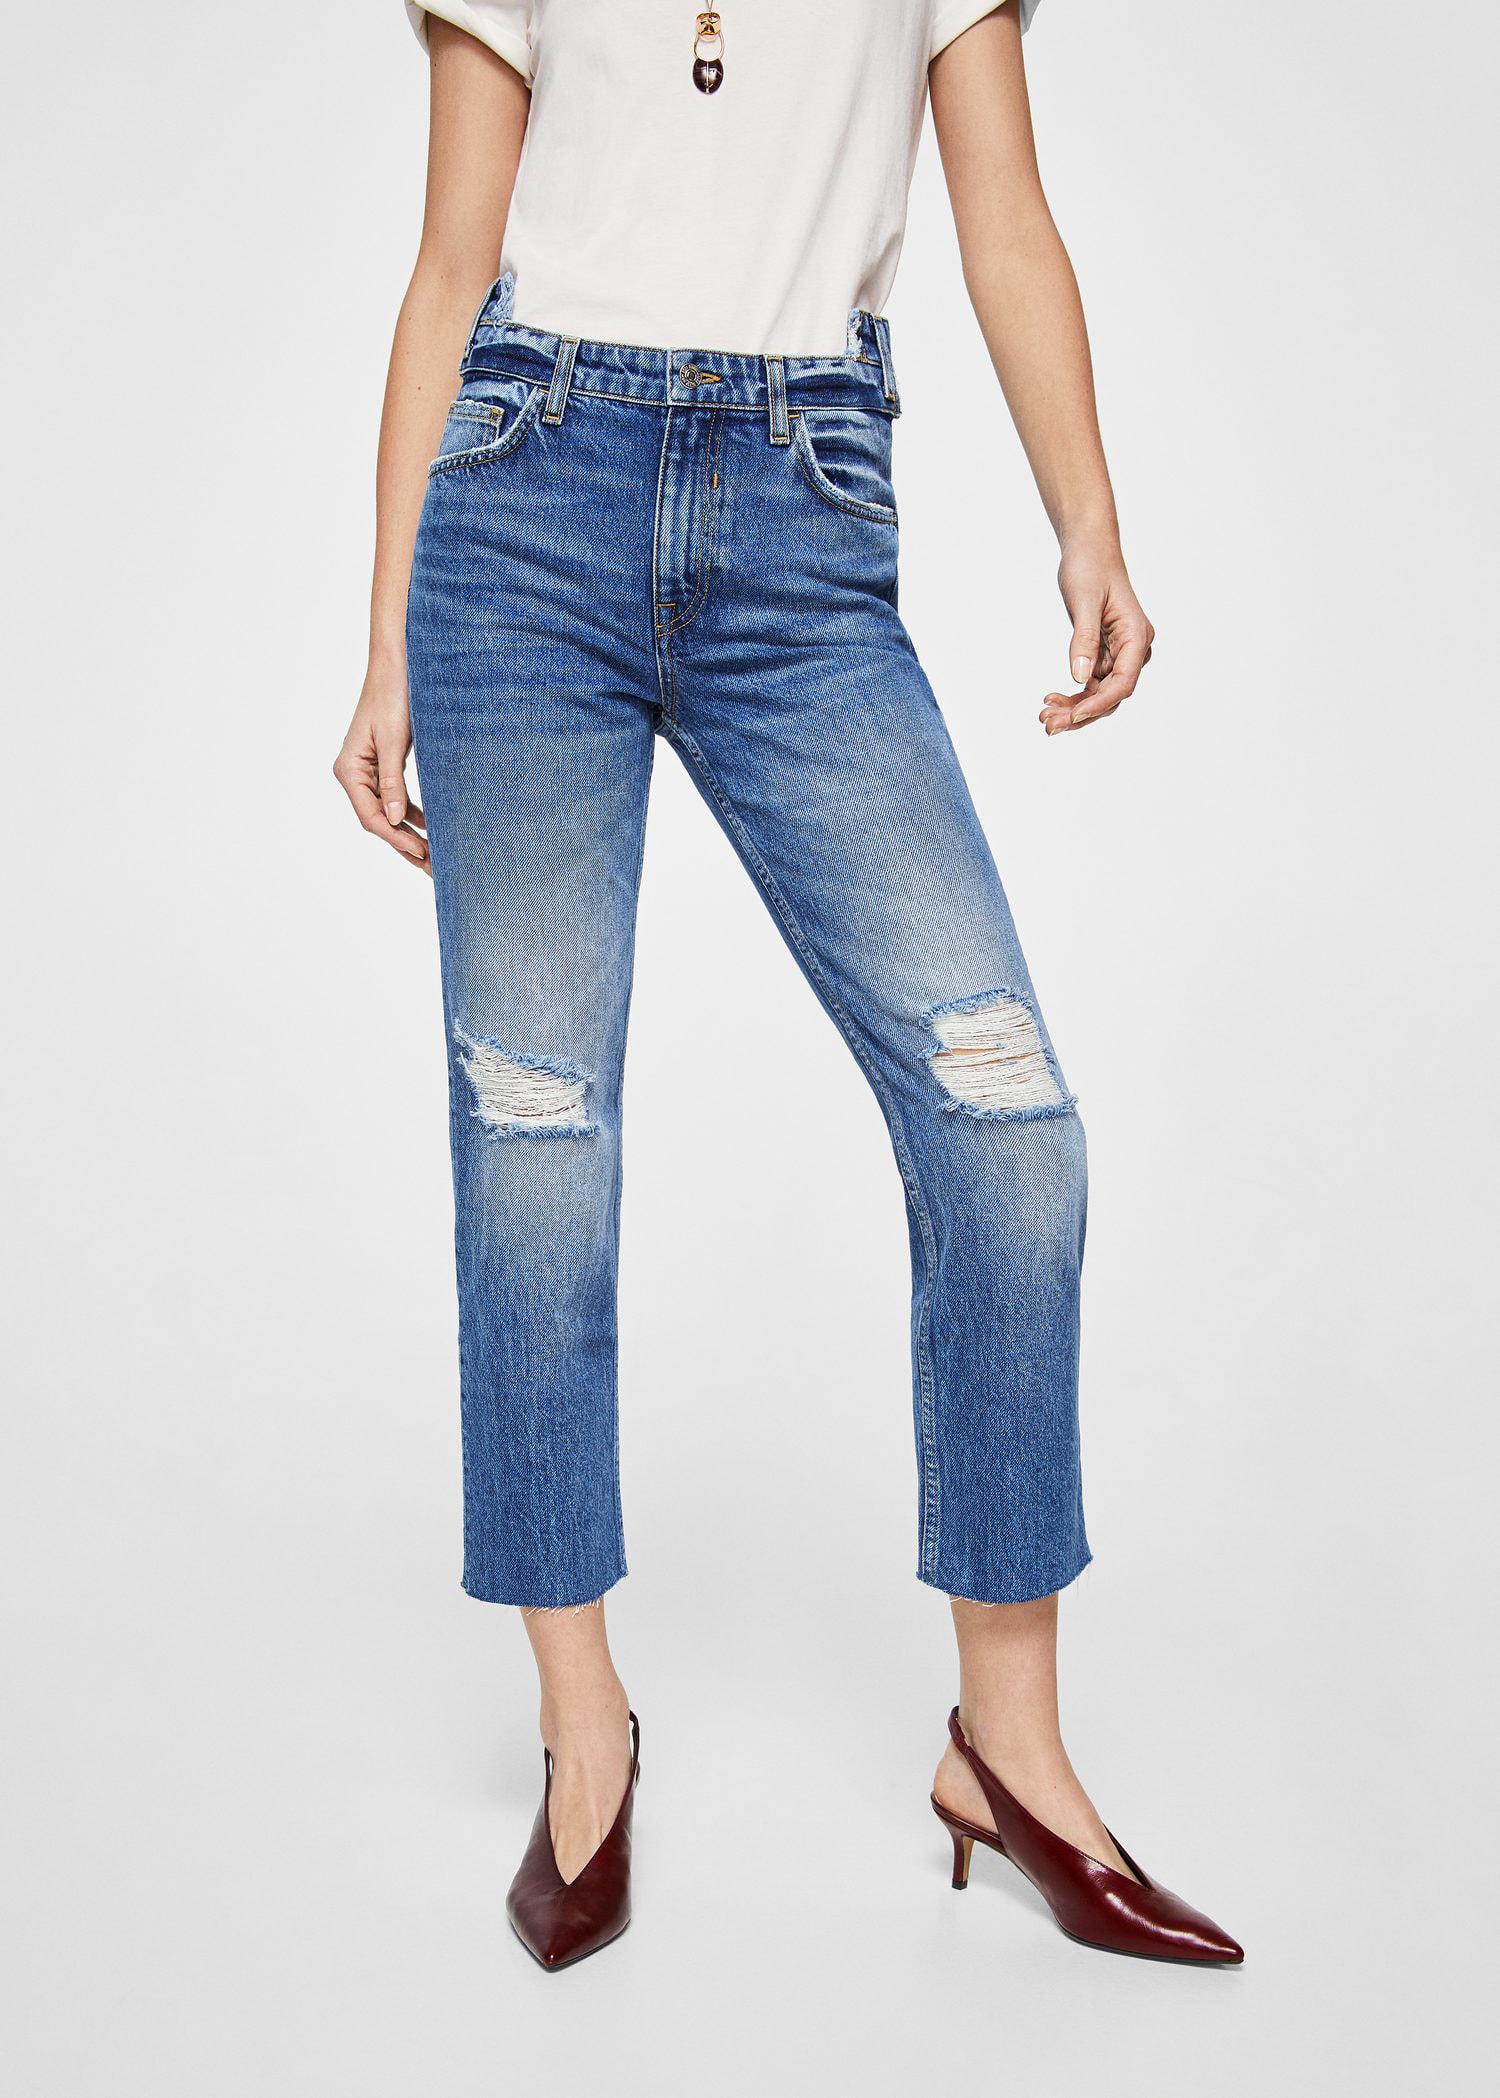 frayed hem straight leg jeans in blue - Blue Mango NptZcP